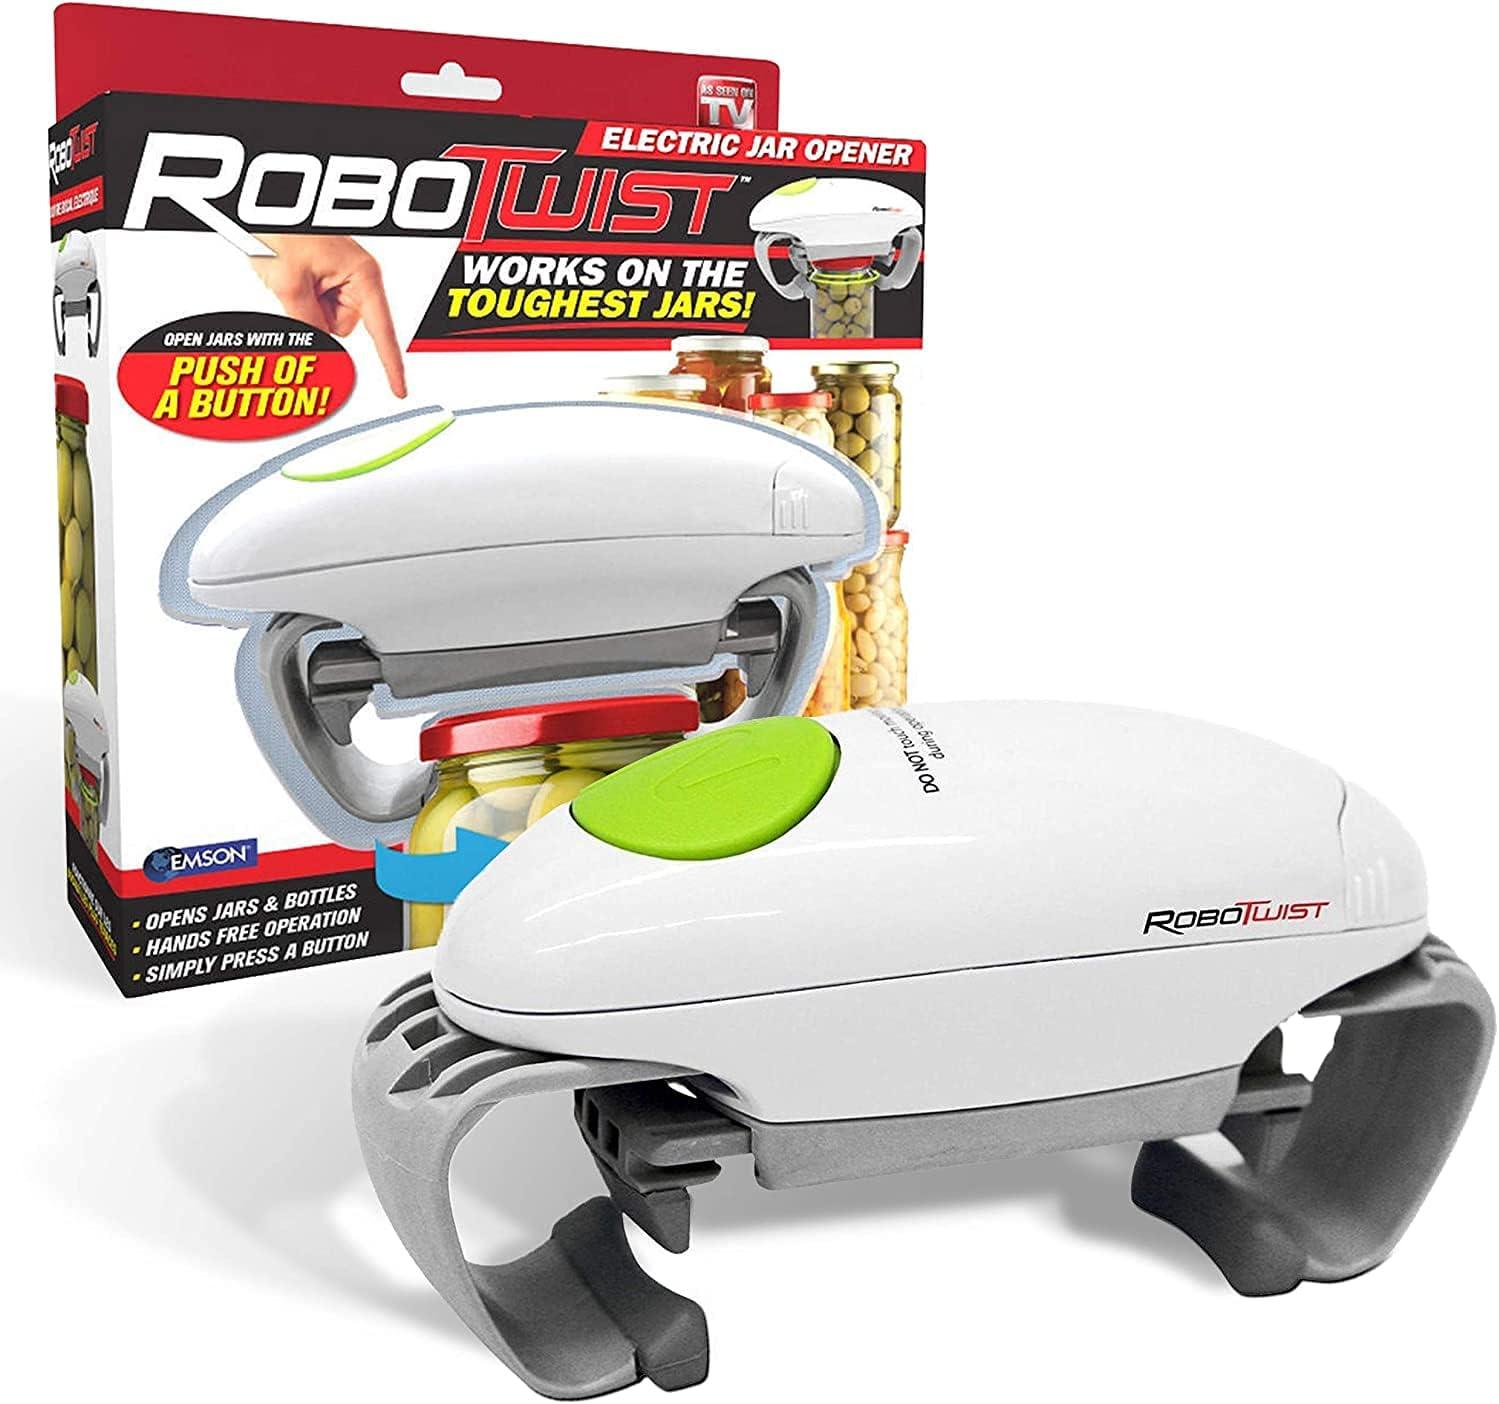 Robo Twist Long-awaited Electric Jar Opener– San Diego Mall Original One The RoboTwist